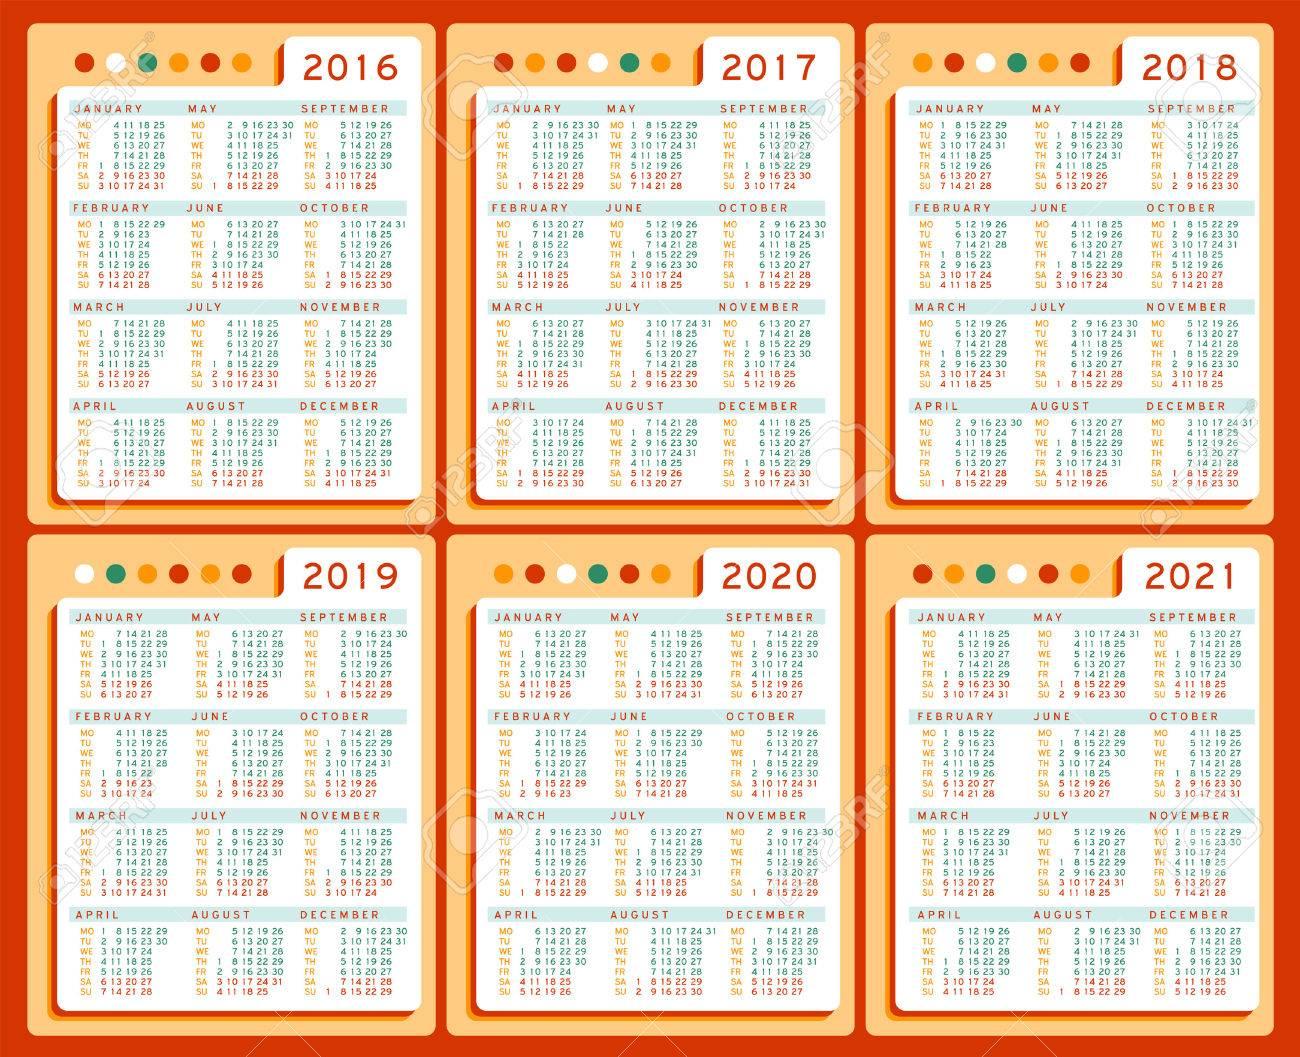 Calendar 2016 2017 2018 2019 2020 2021 Years Vector Set In English